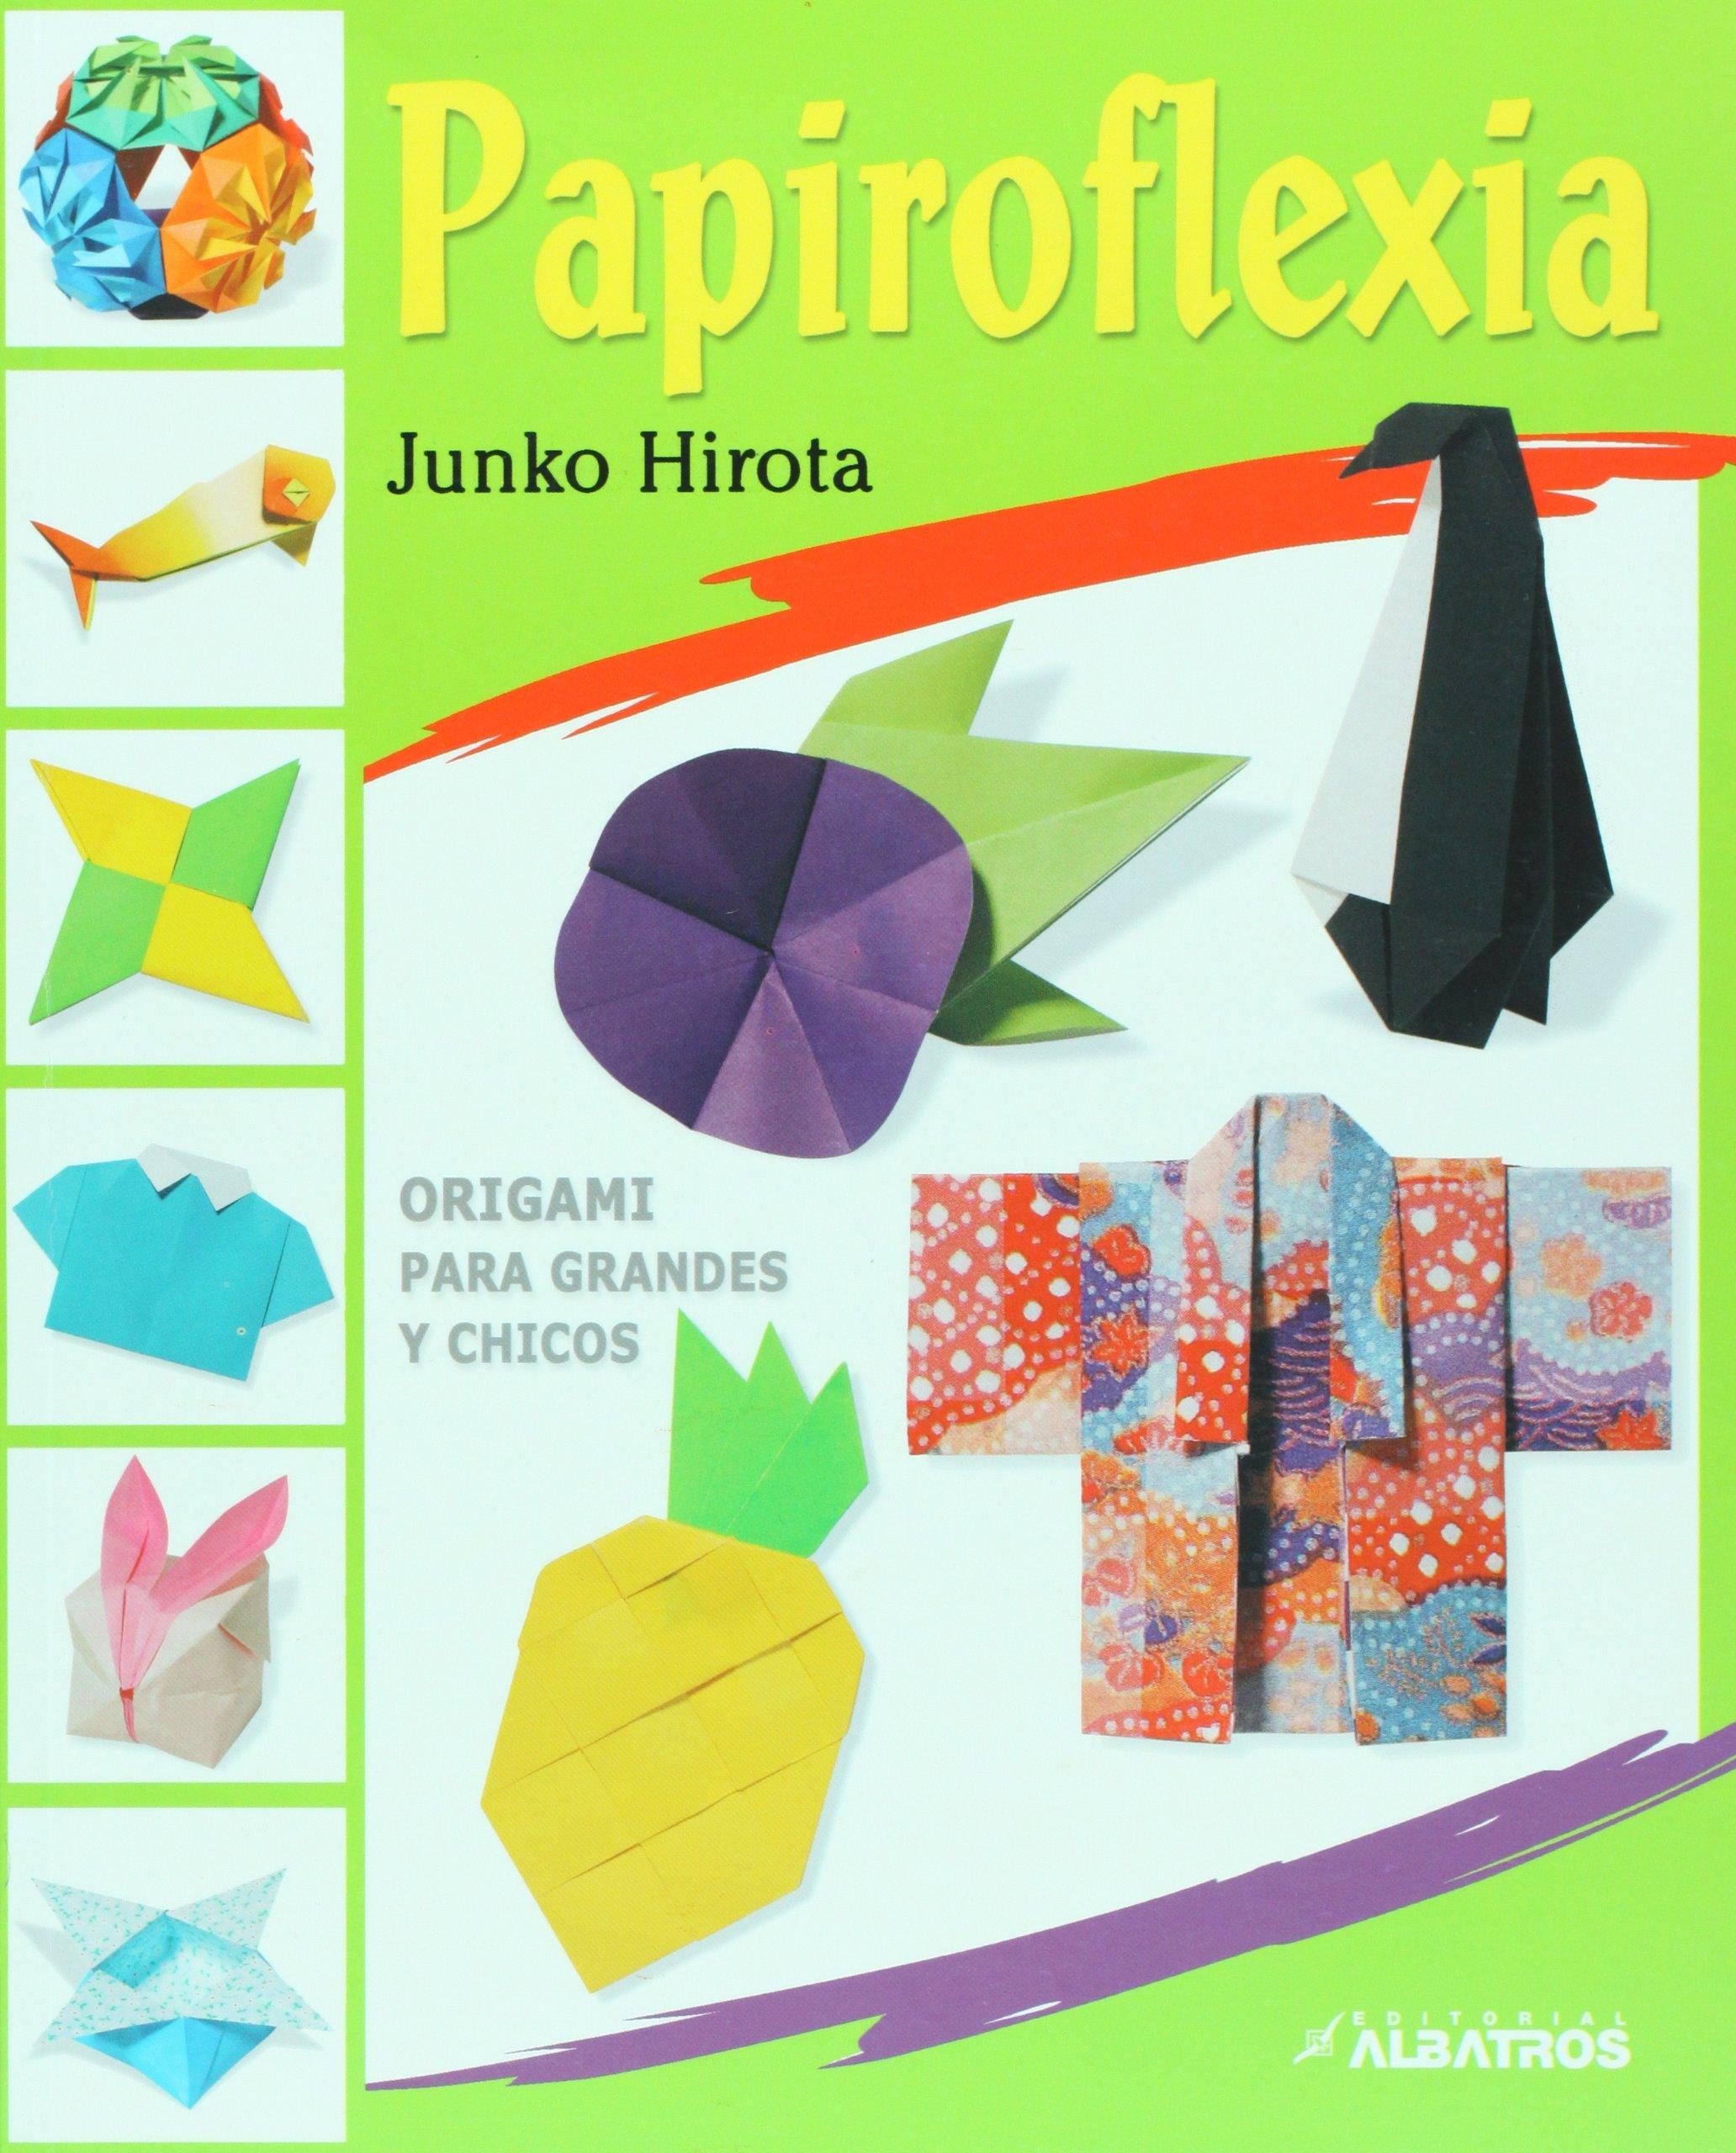 Papiroflexia - Origami (Spanish Edition) (Spanish) Paperback – June 24, 2008